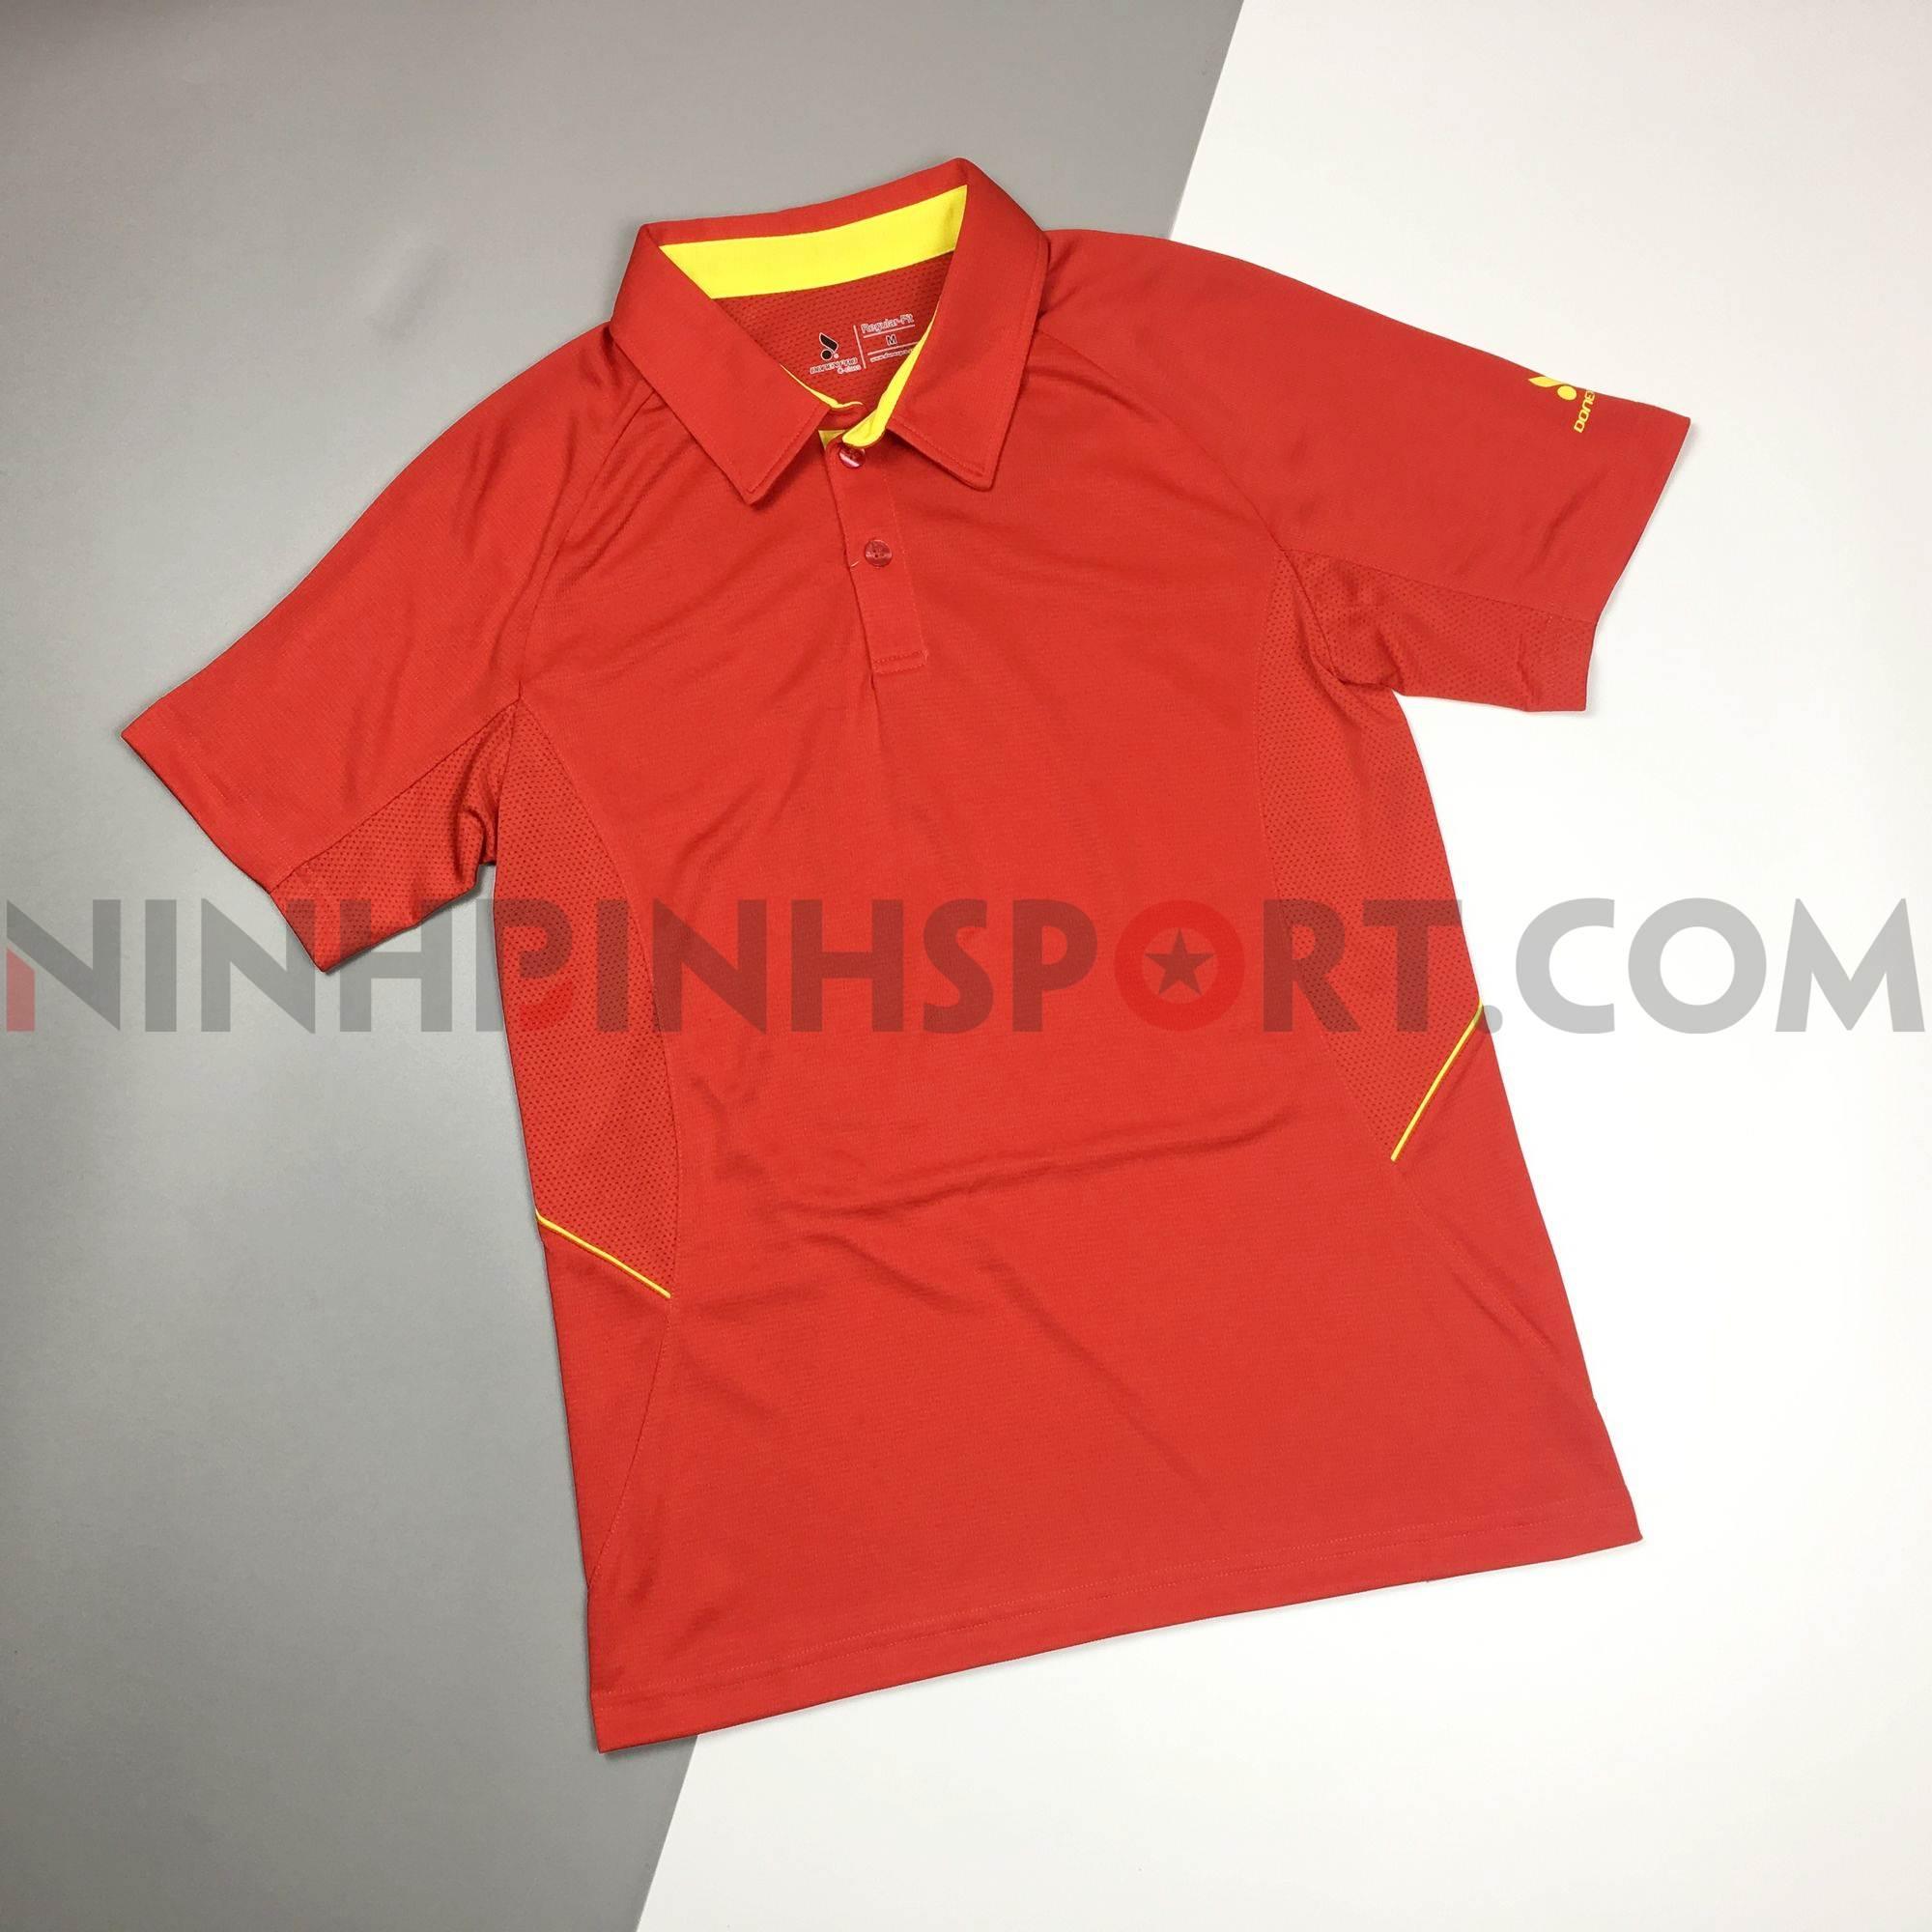 Áo thể thao nam Donex Polo MC-8994-07-06